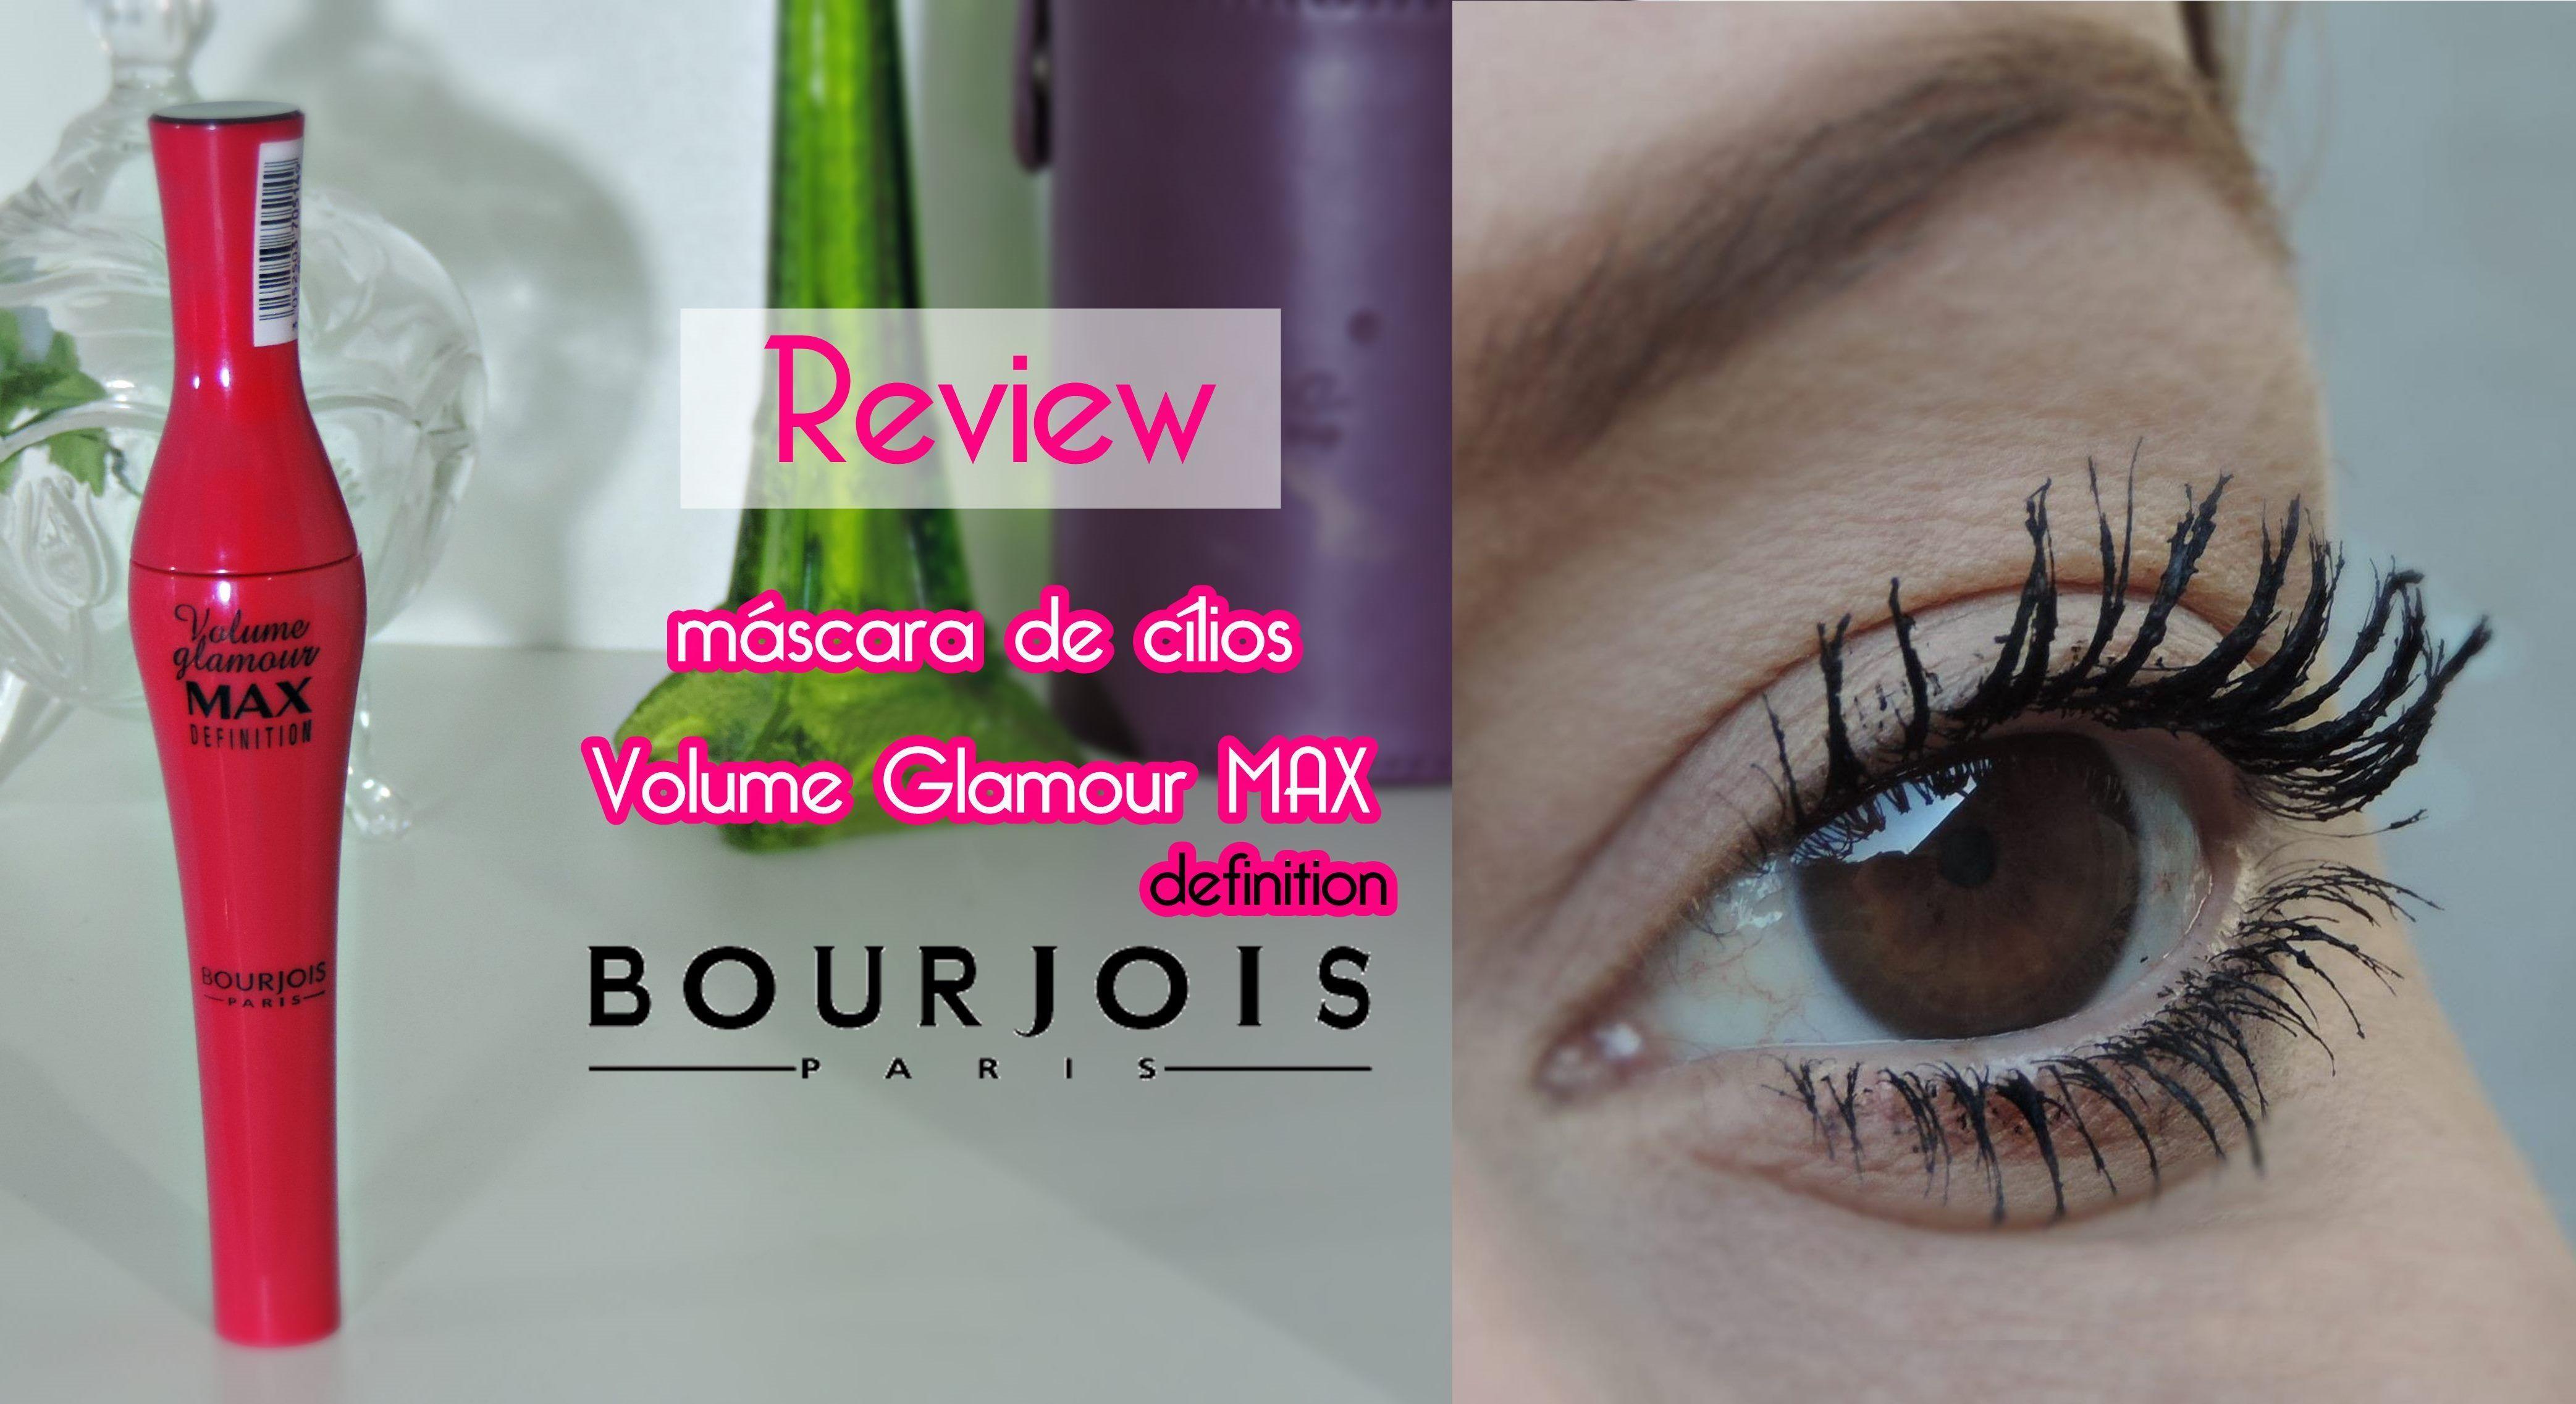 Review da máscara de cílios poderosa da Bourjois 'Volume Glamour MAX' maravilhosa demais!  Confira: http://www.blogflordemulher.com.br/2015/07/review-mascara-de-cilios-volume-glamour.html